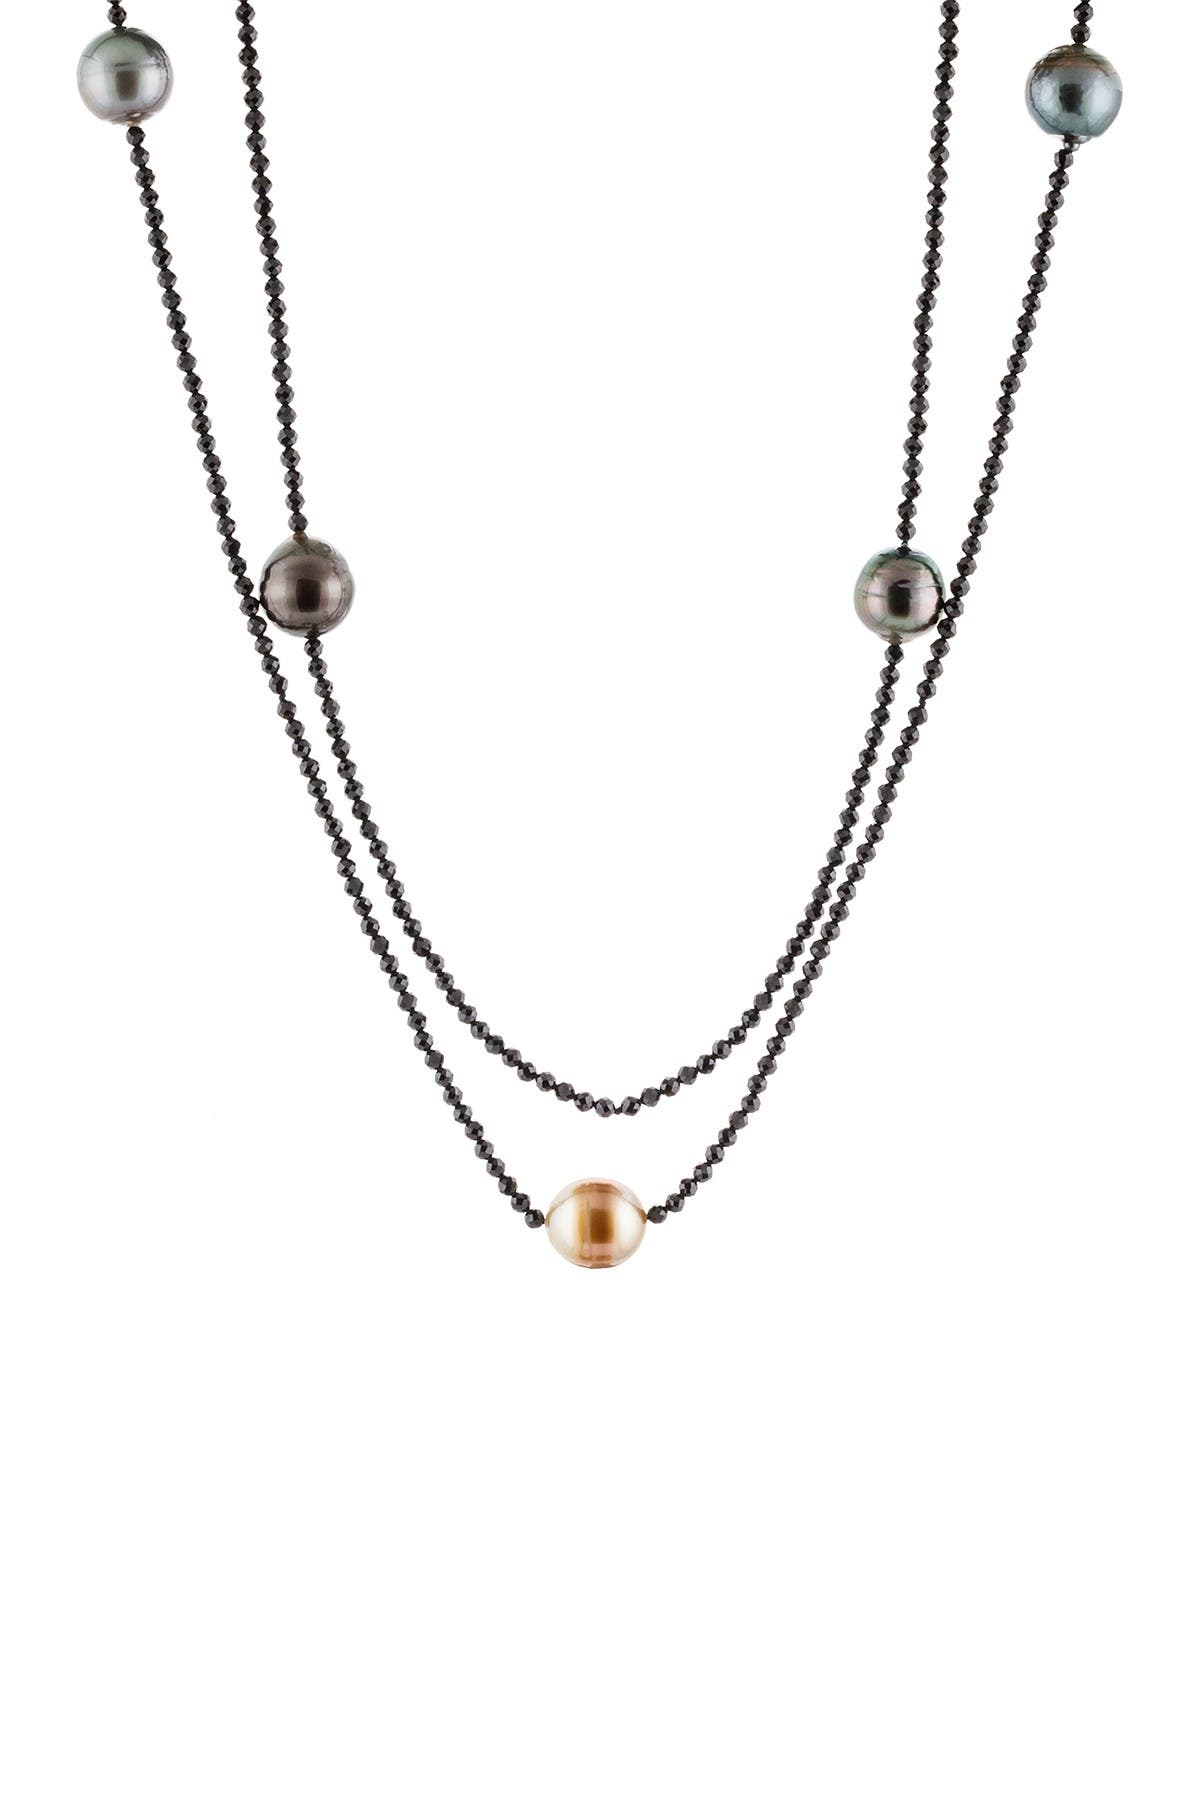 Image of Splendid Pearls 9-10mm Black Tahitian Pearl Endless Necklace